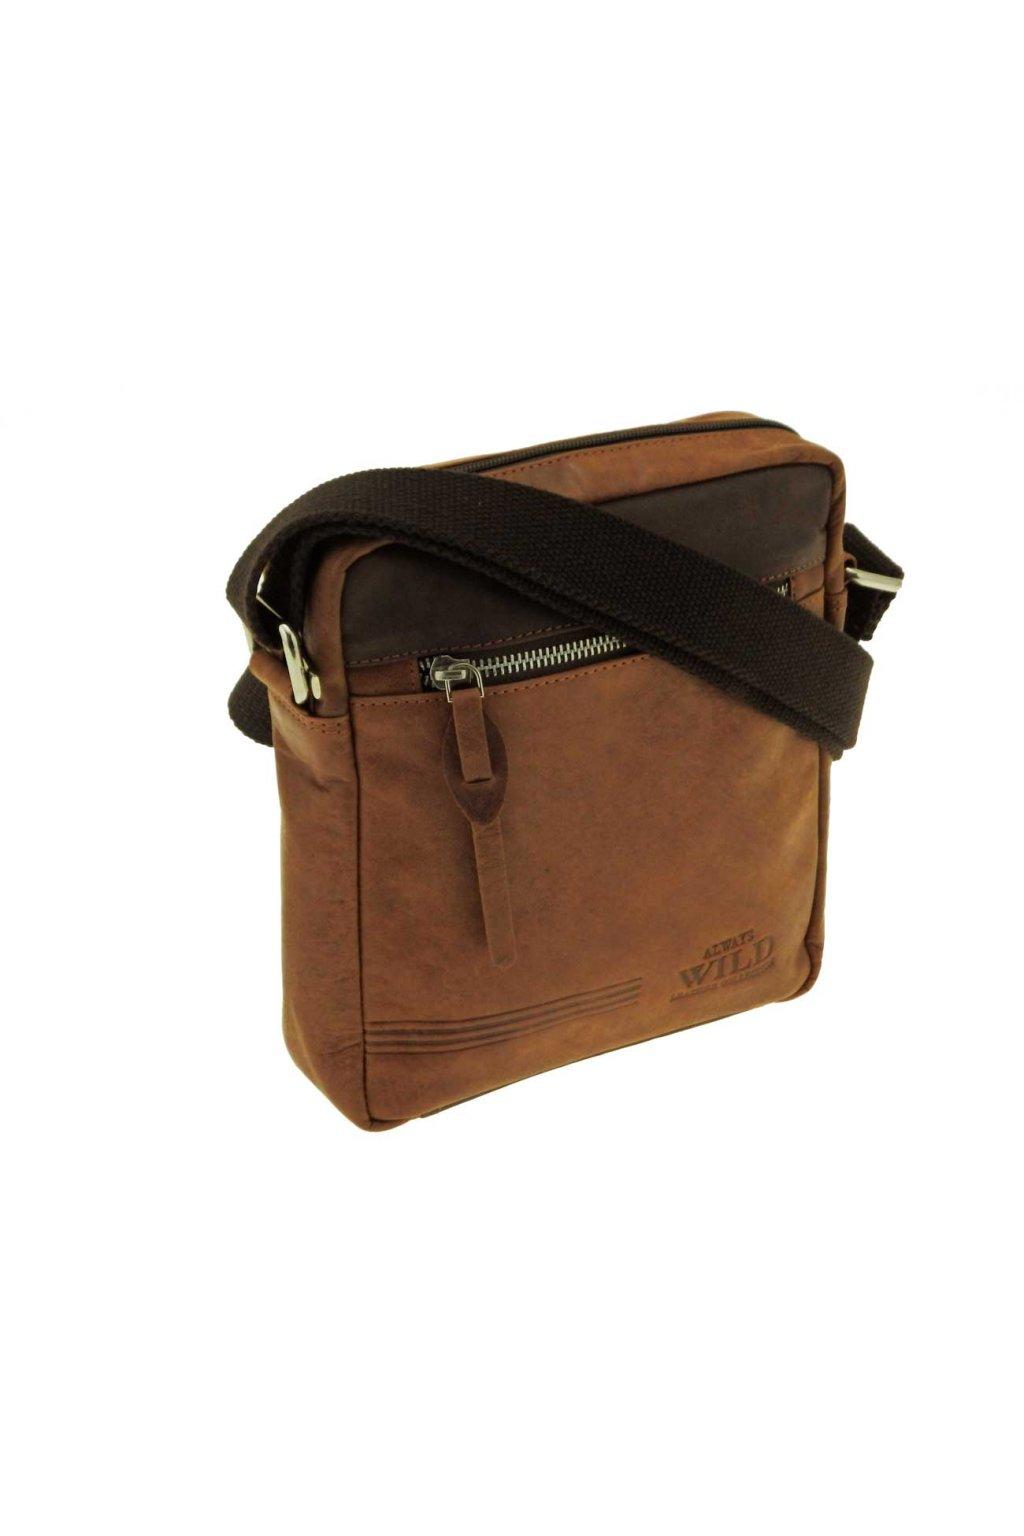 panska kozena taska pres rameno hneda TK10 BAG 1 HB